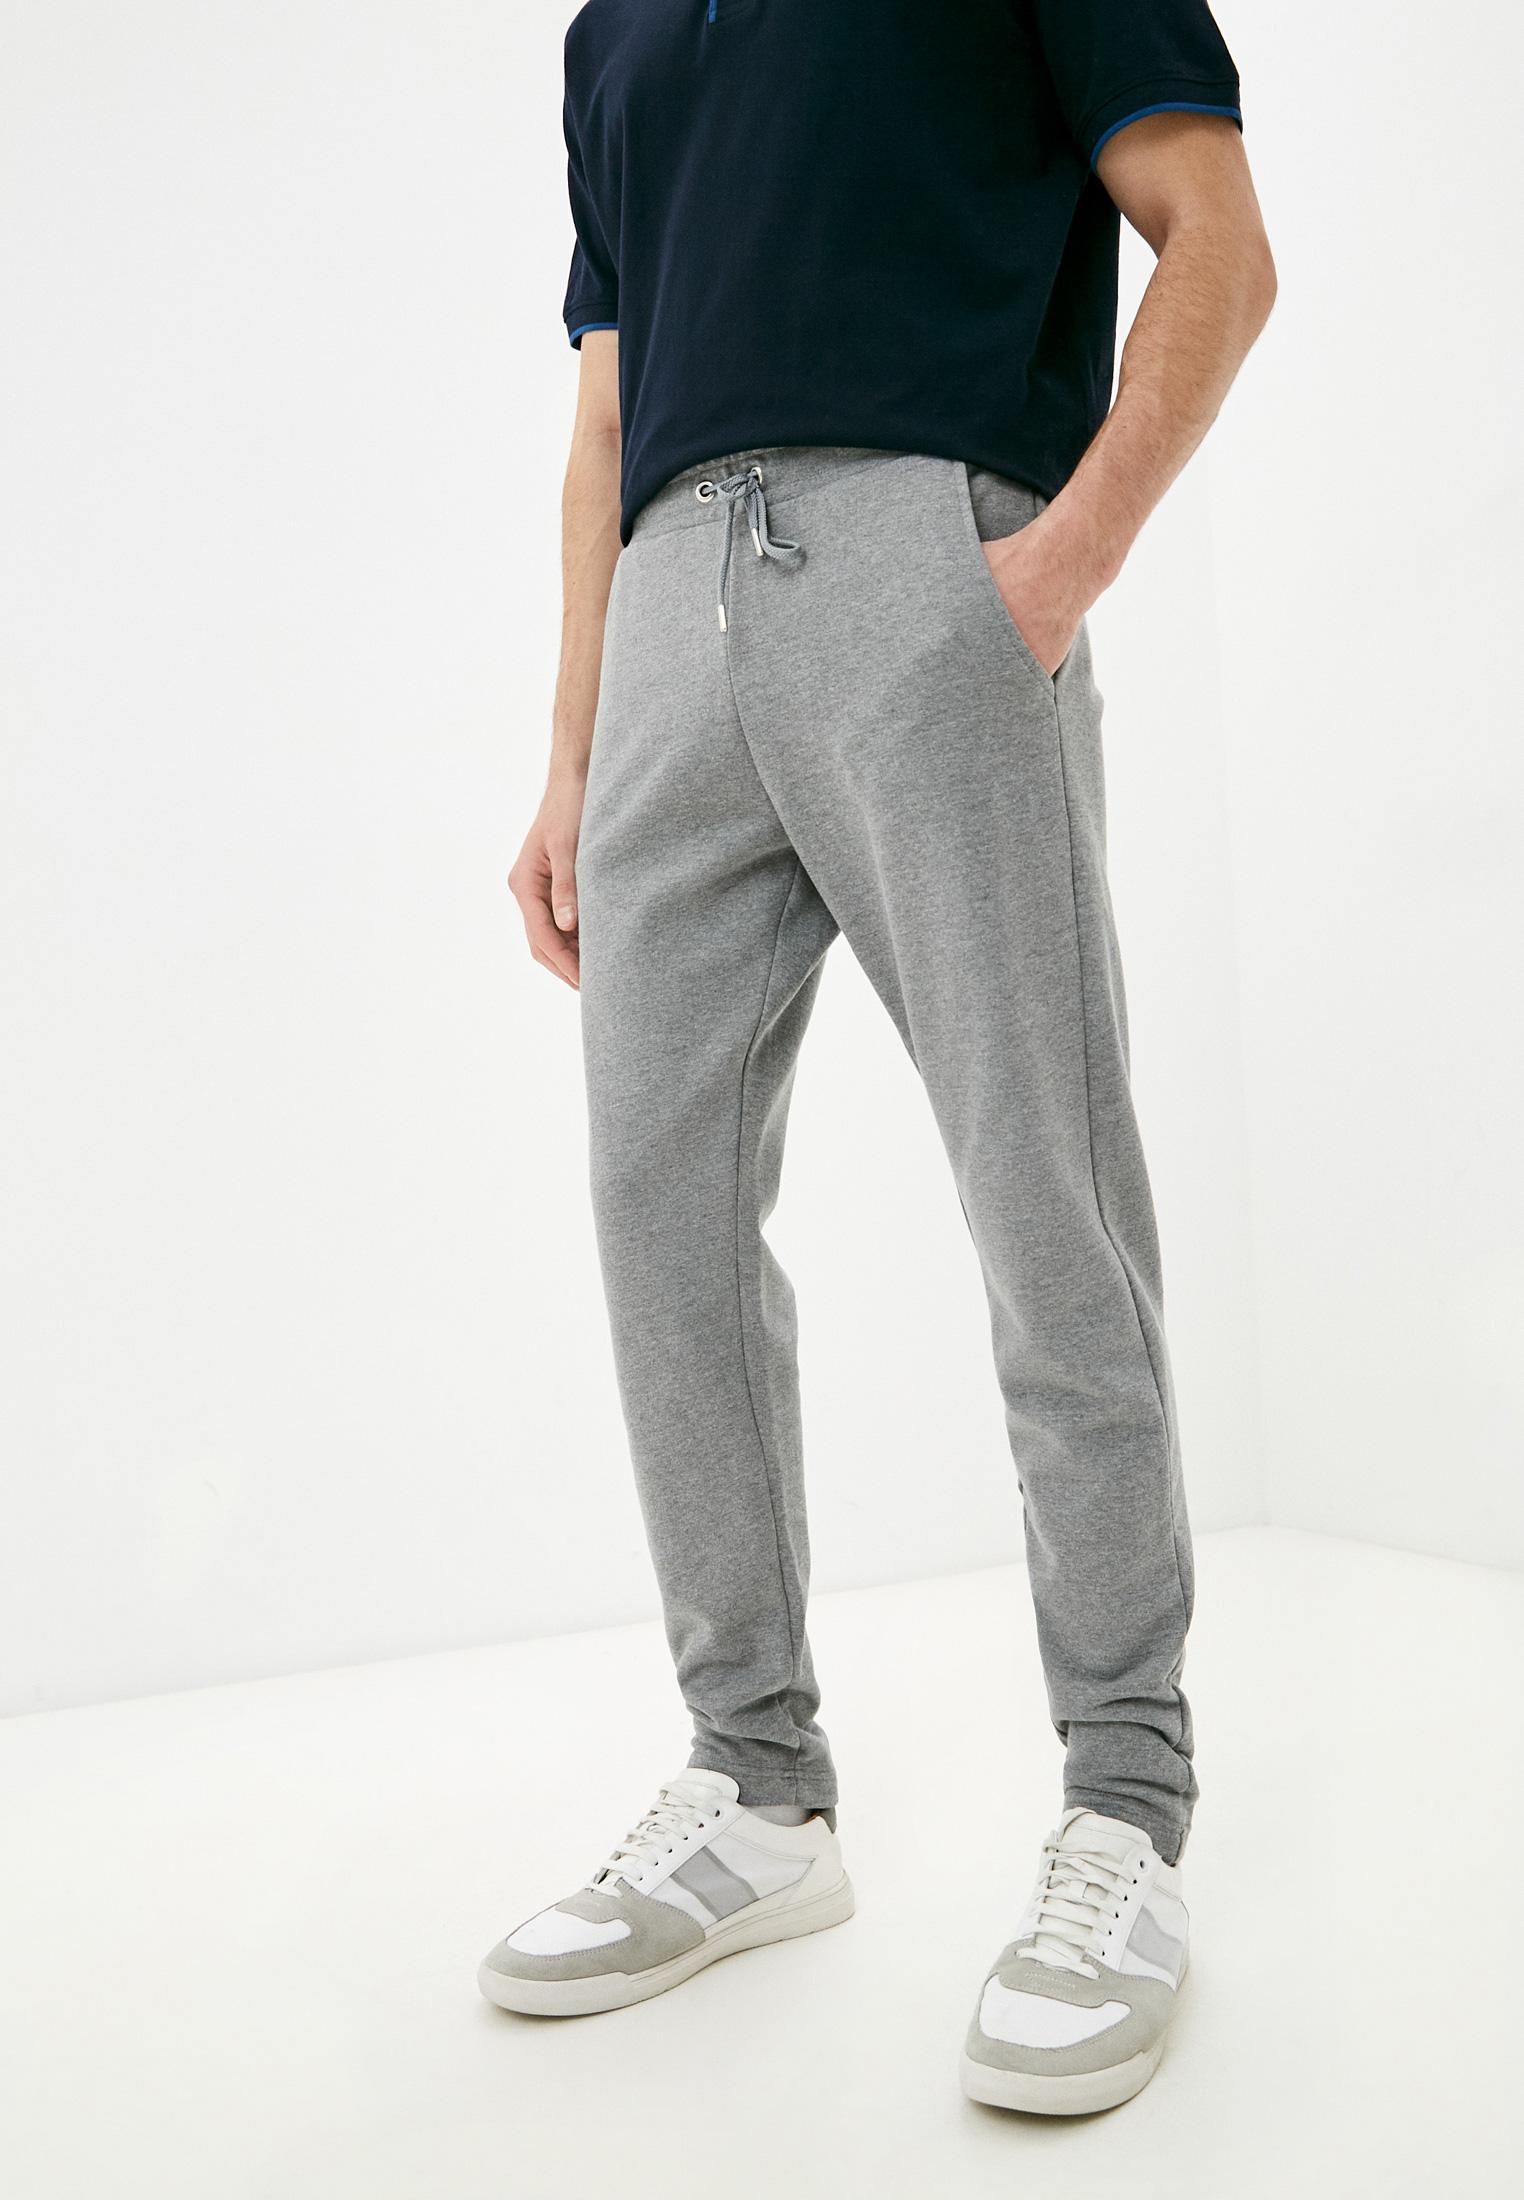 Мужские спортивные брюки Harmont & Blaine Брюки спортивные Harmont & Blaine